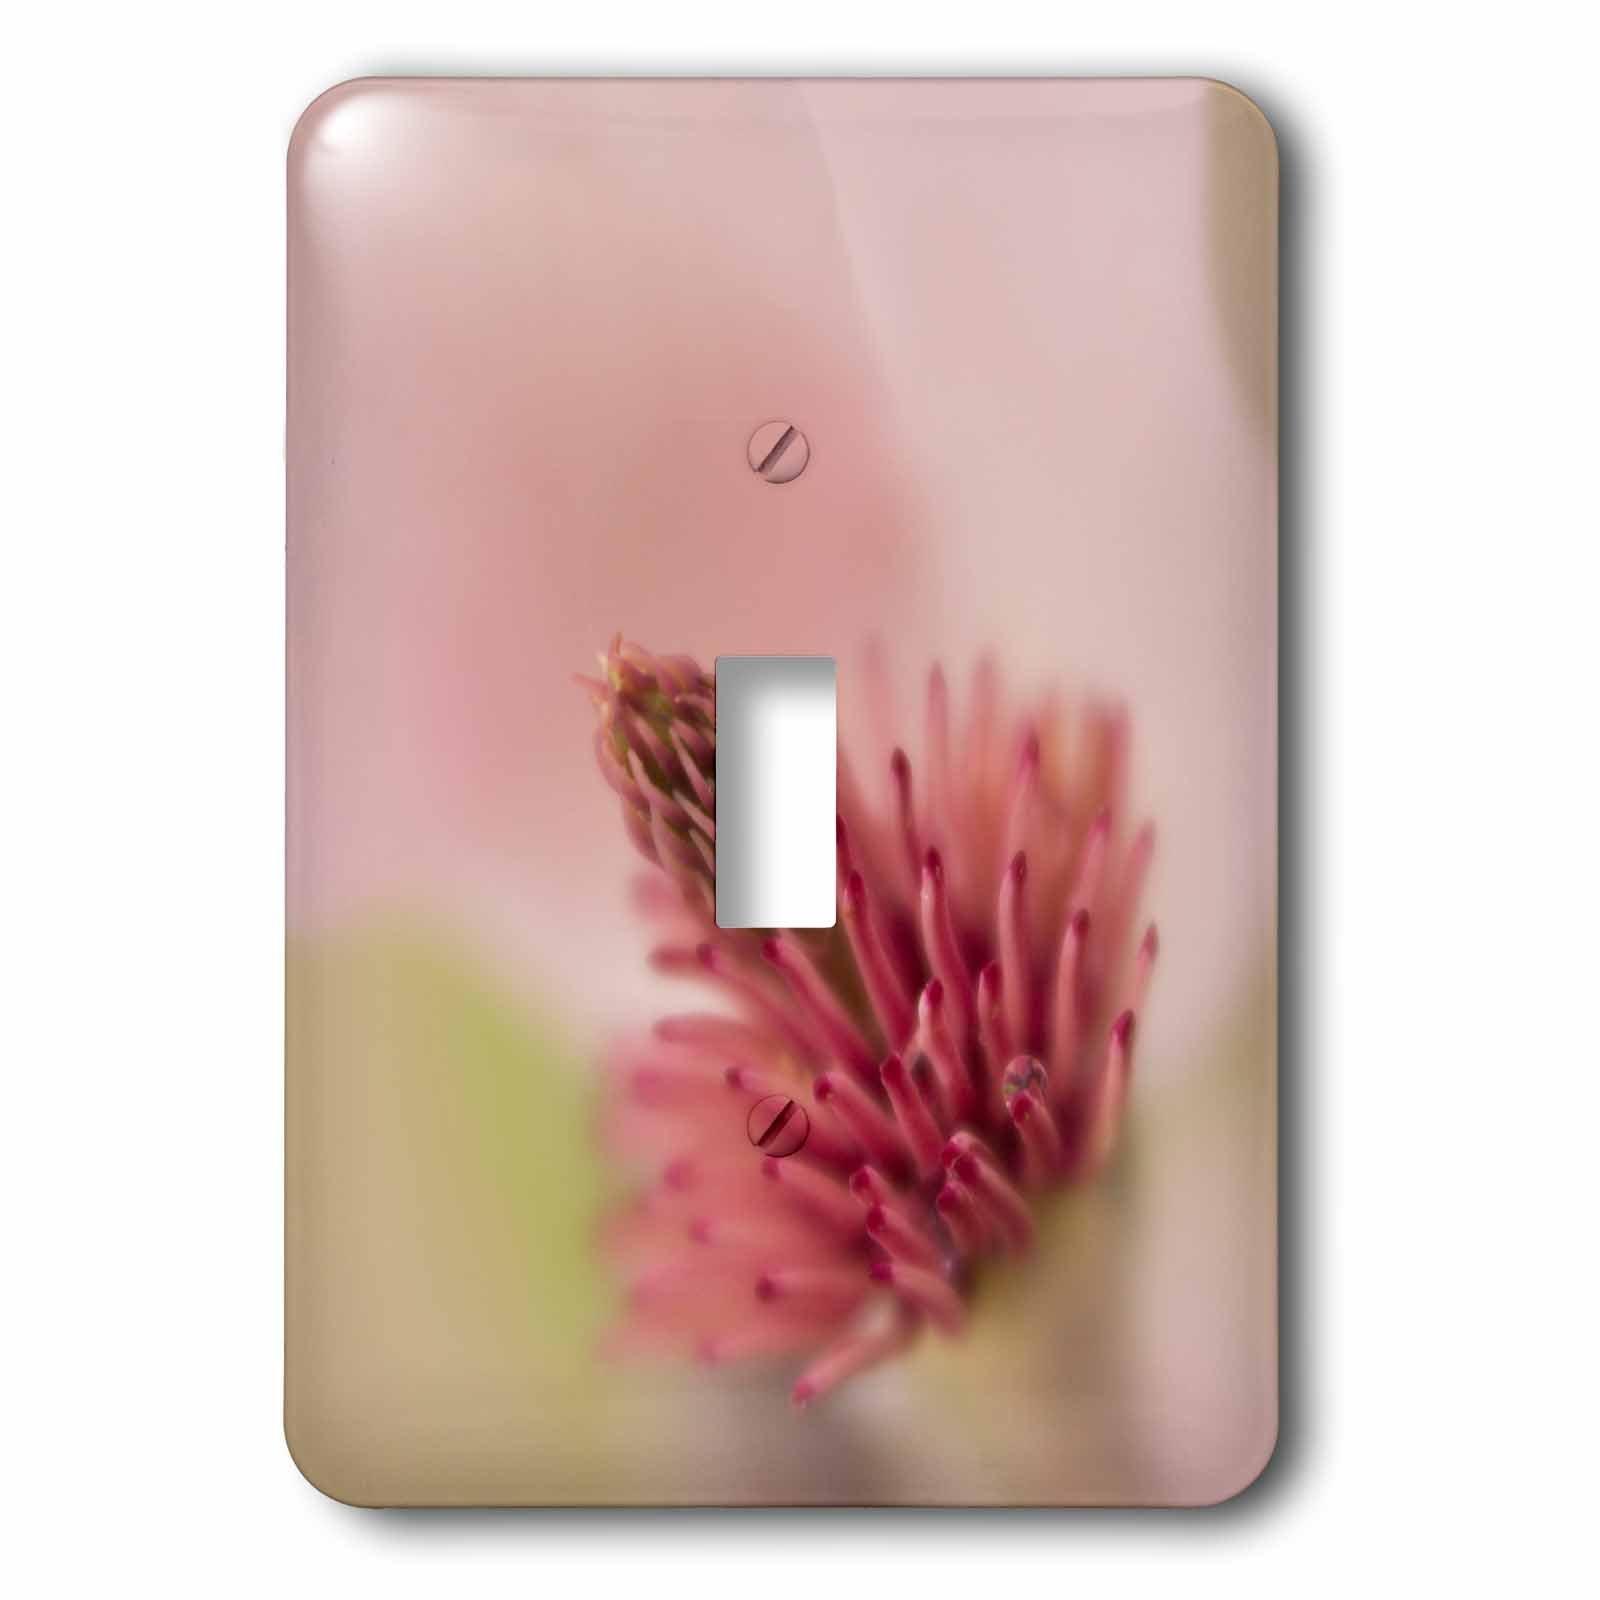 3dRose Danita Delimont - Flowers - USA, South Carolina, Charleston. Magnolia flower detail. - Light Switch Covers - single toggle switch (lsp_259973_1)